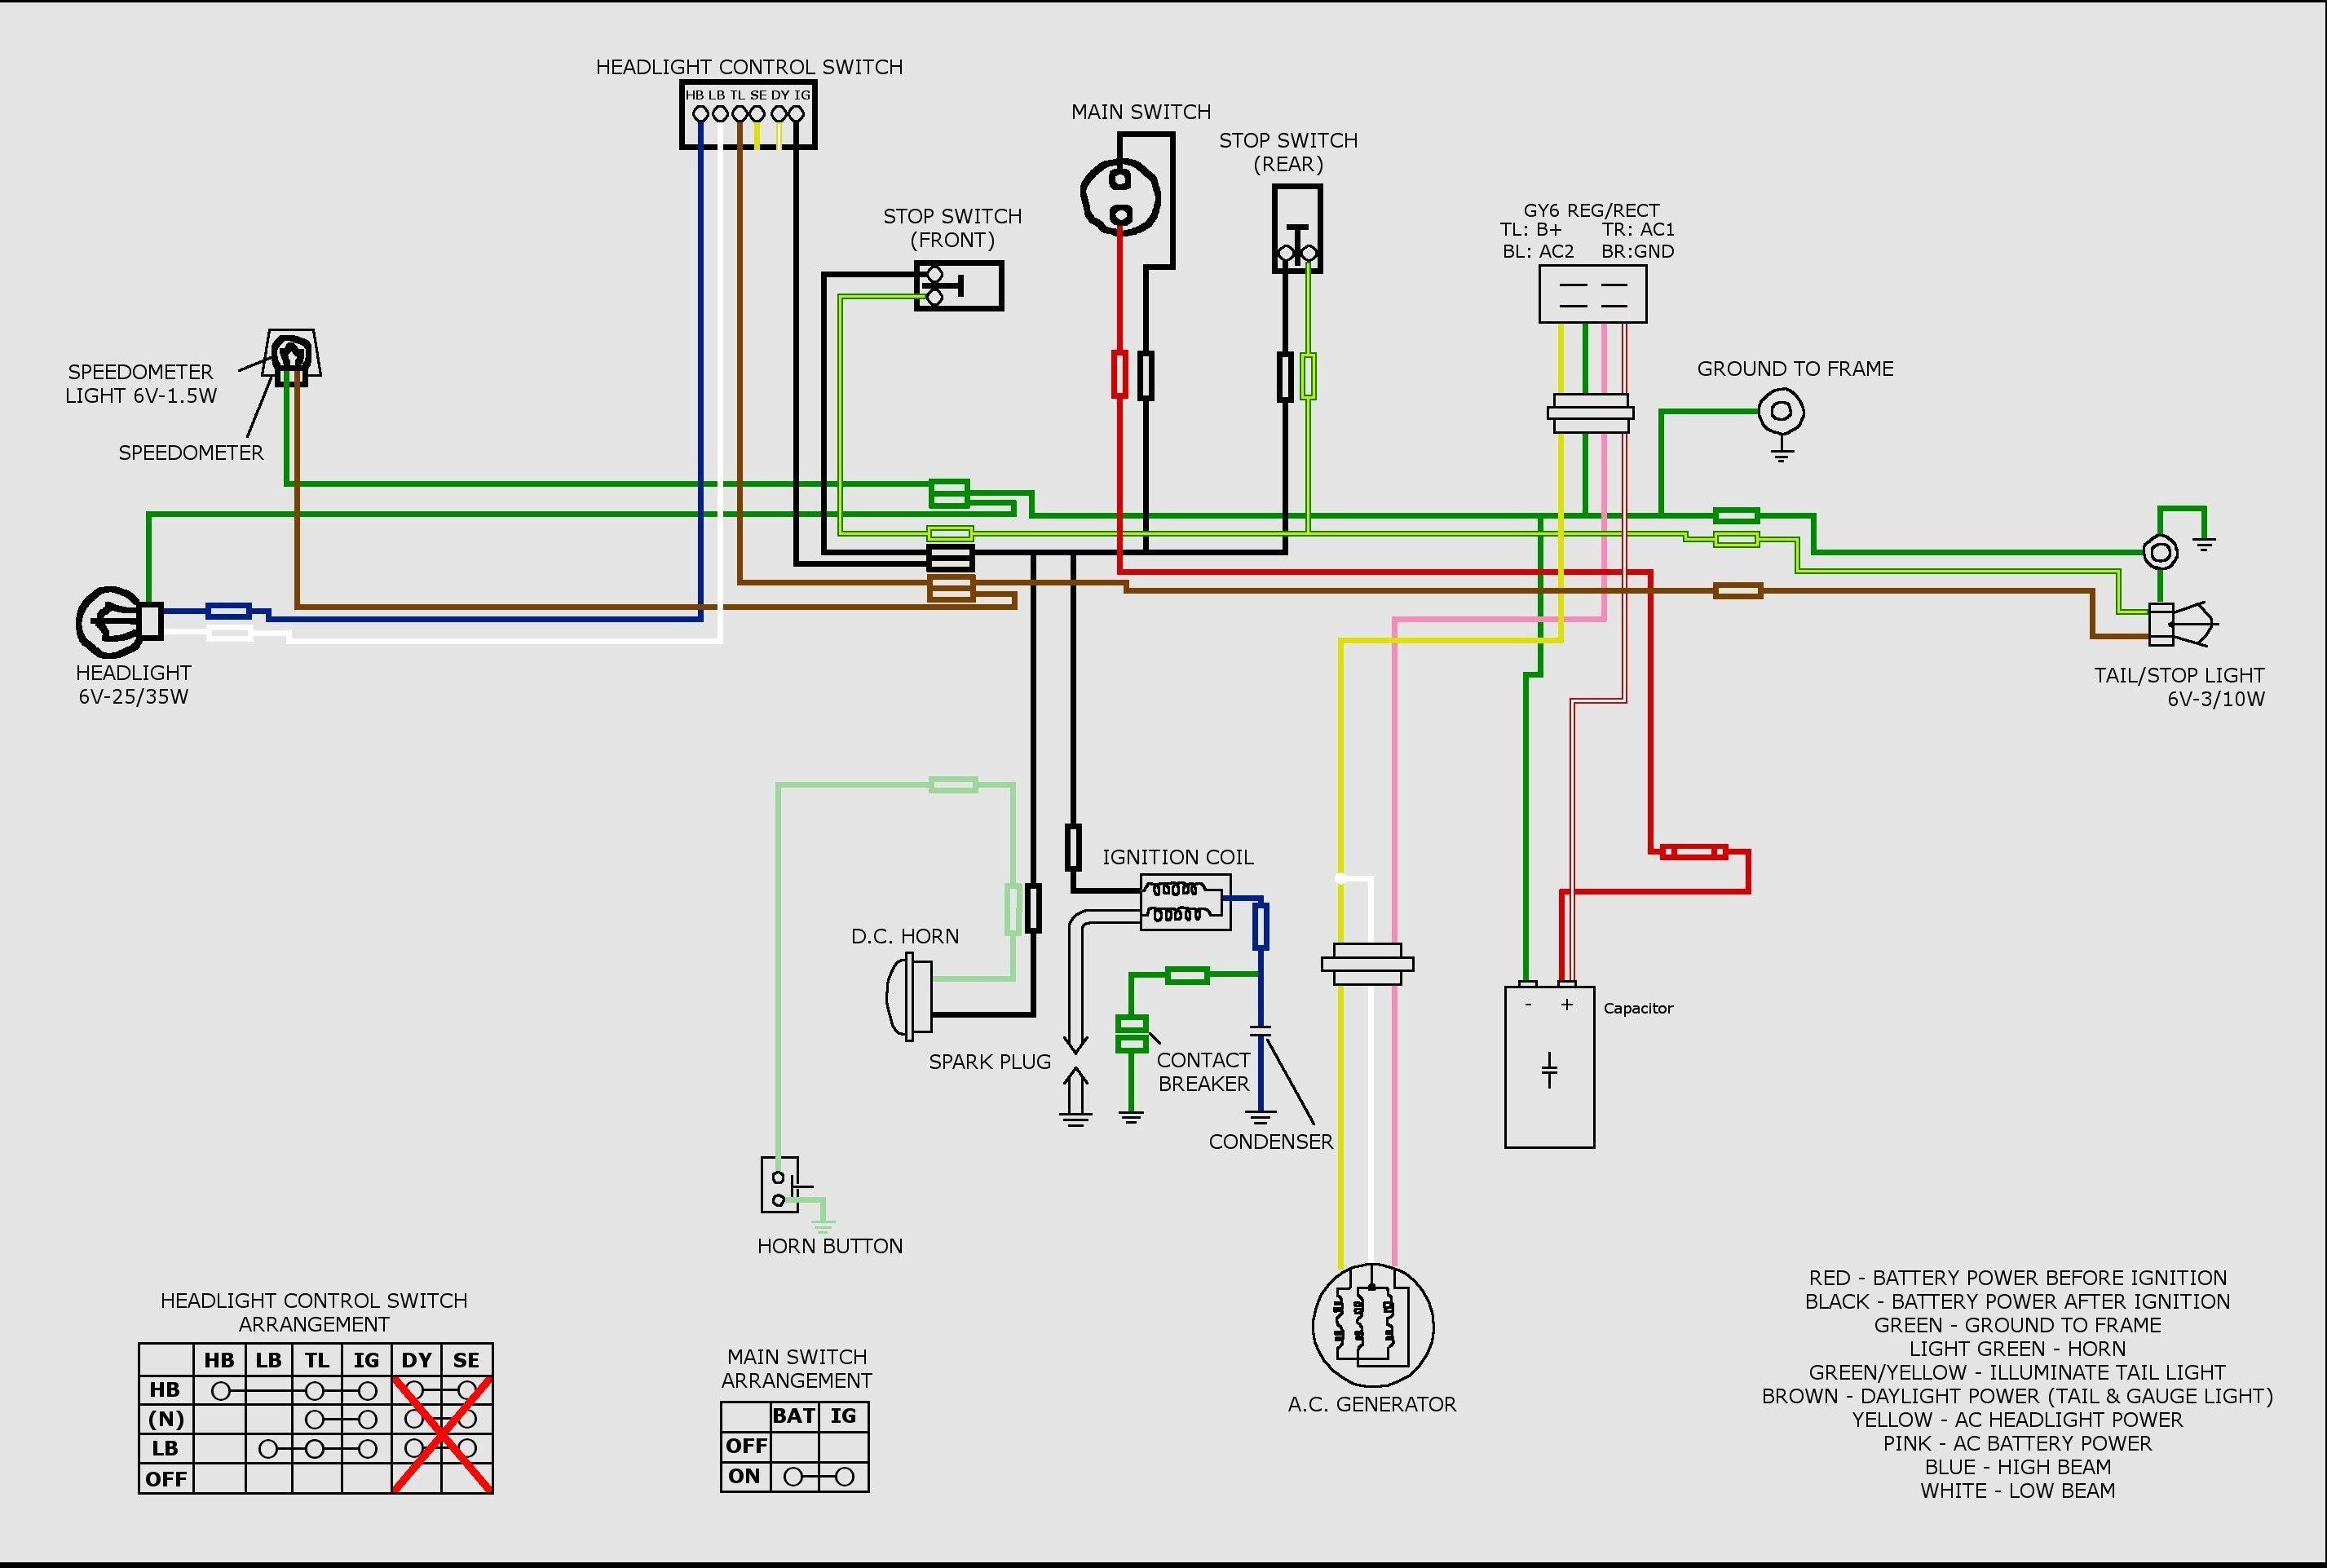 Ford Upfitter Switch Wiring Diagram 2011 F948 sony Cdx M10 Wiring Diagram Of Ford Upfitter Switch Wiring Diagram 2011